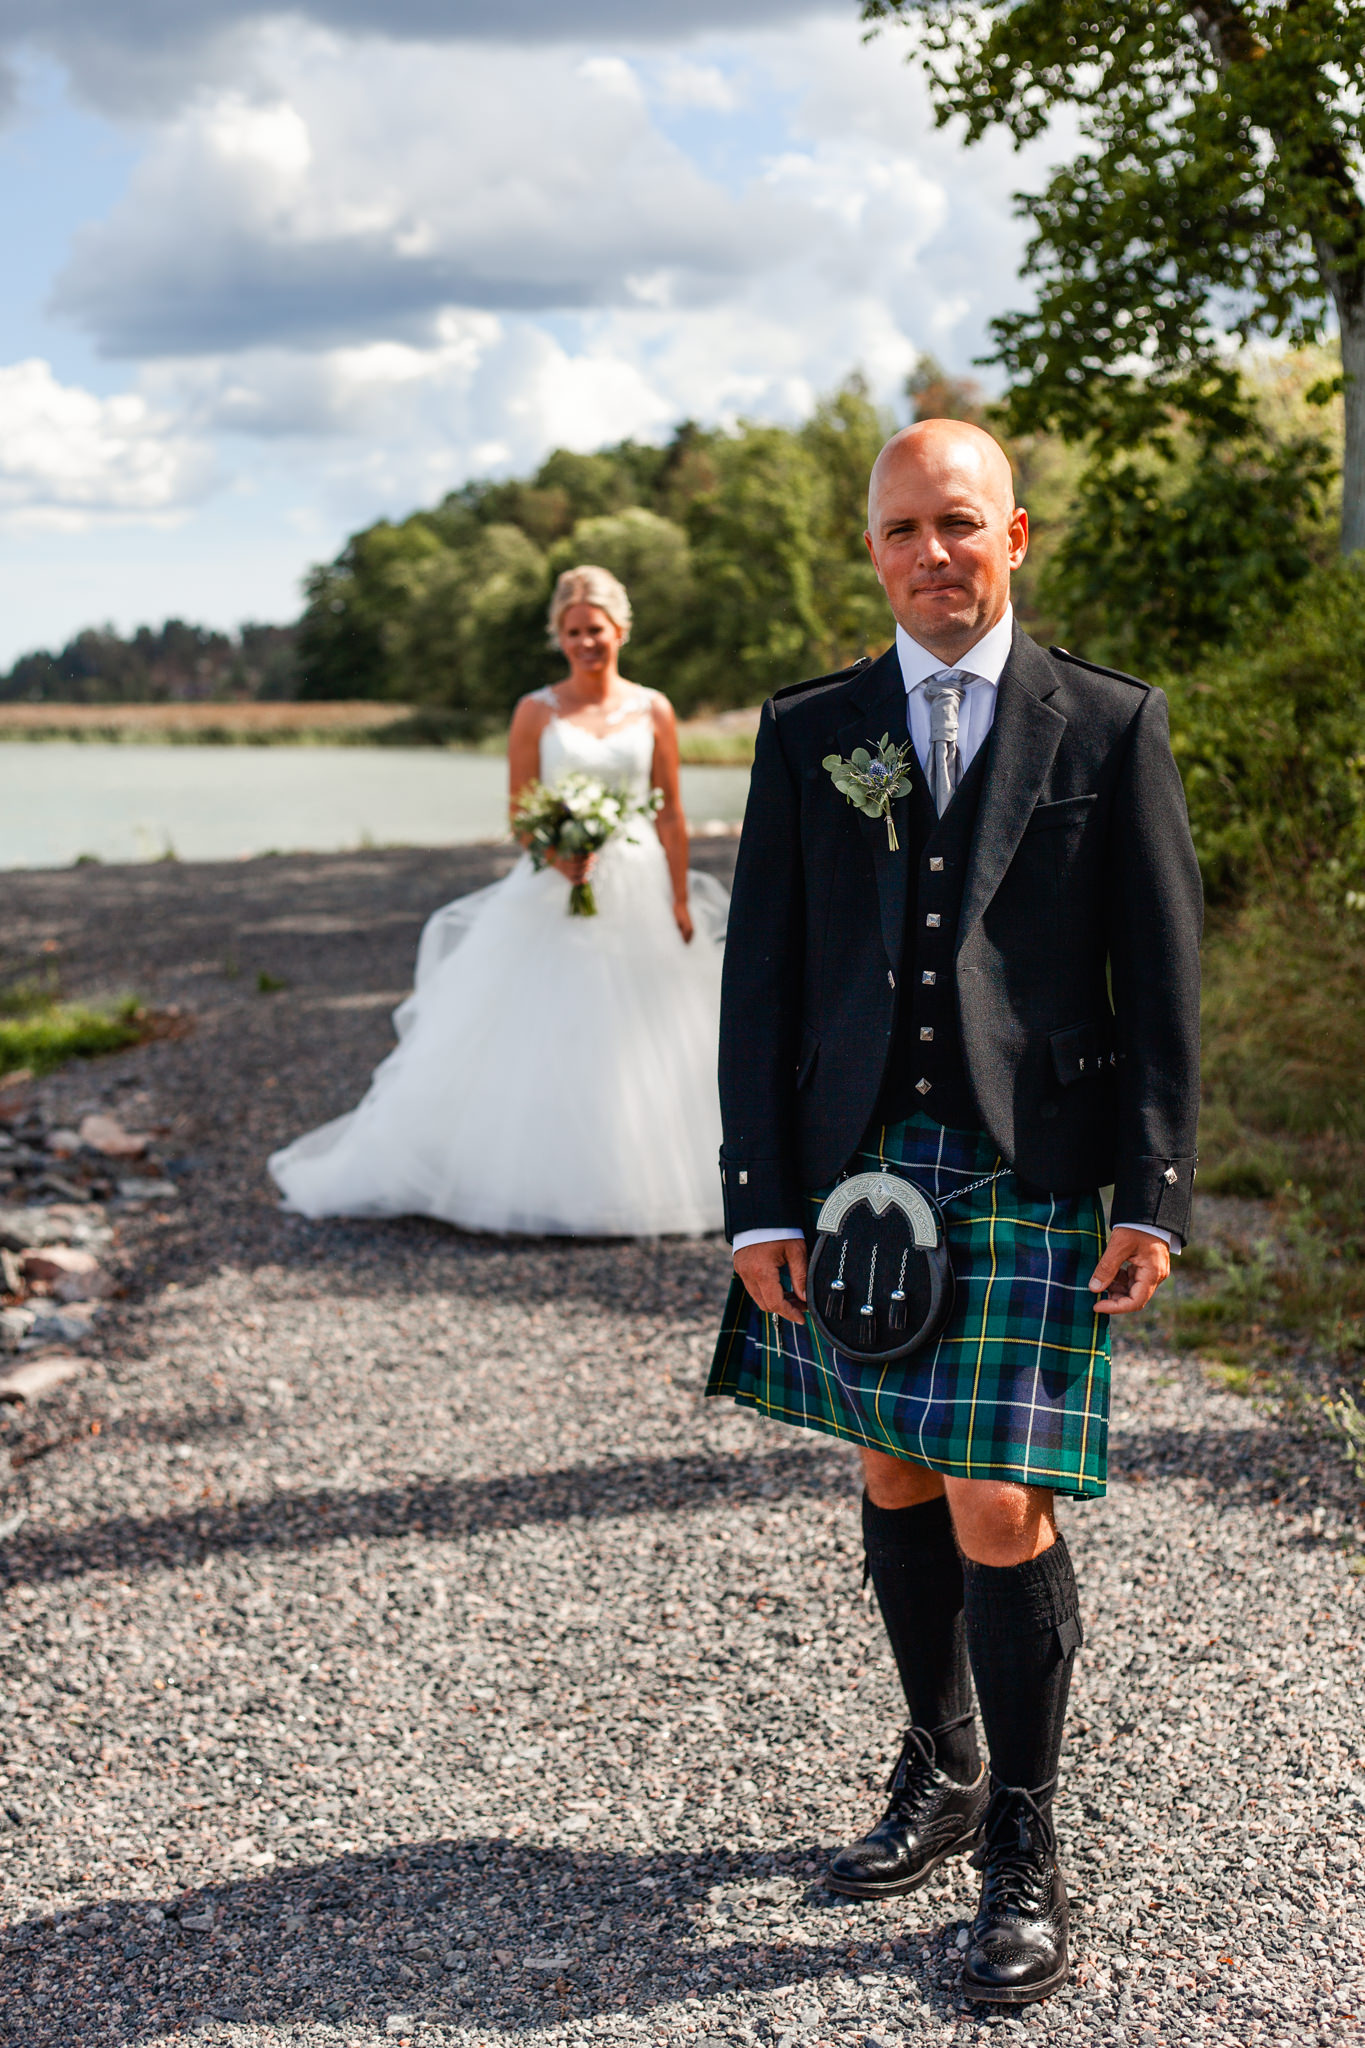 Skotskt bröllop på Mauritzberg Slott Vikbolandet